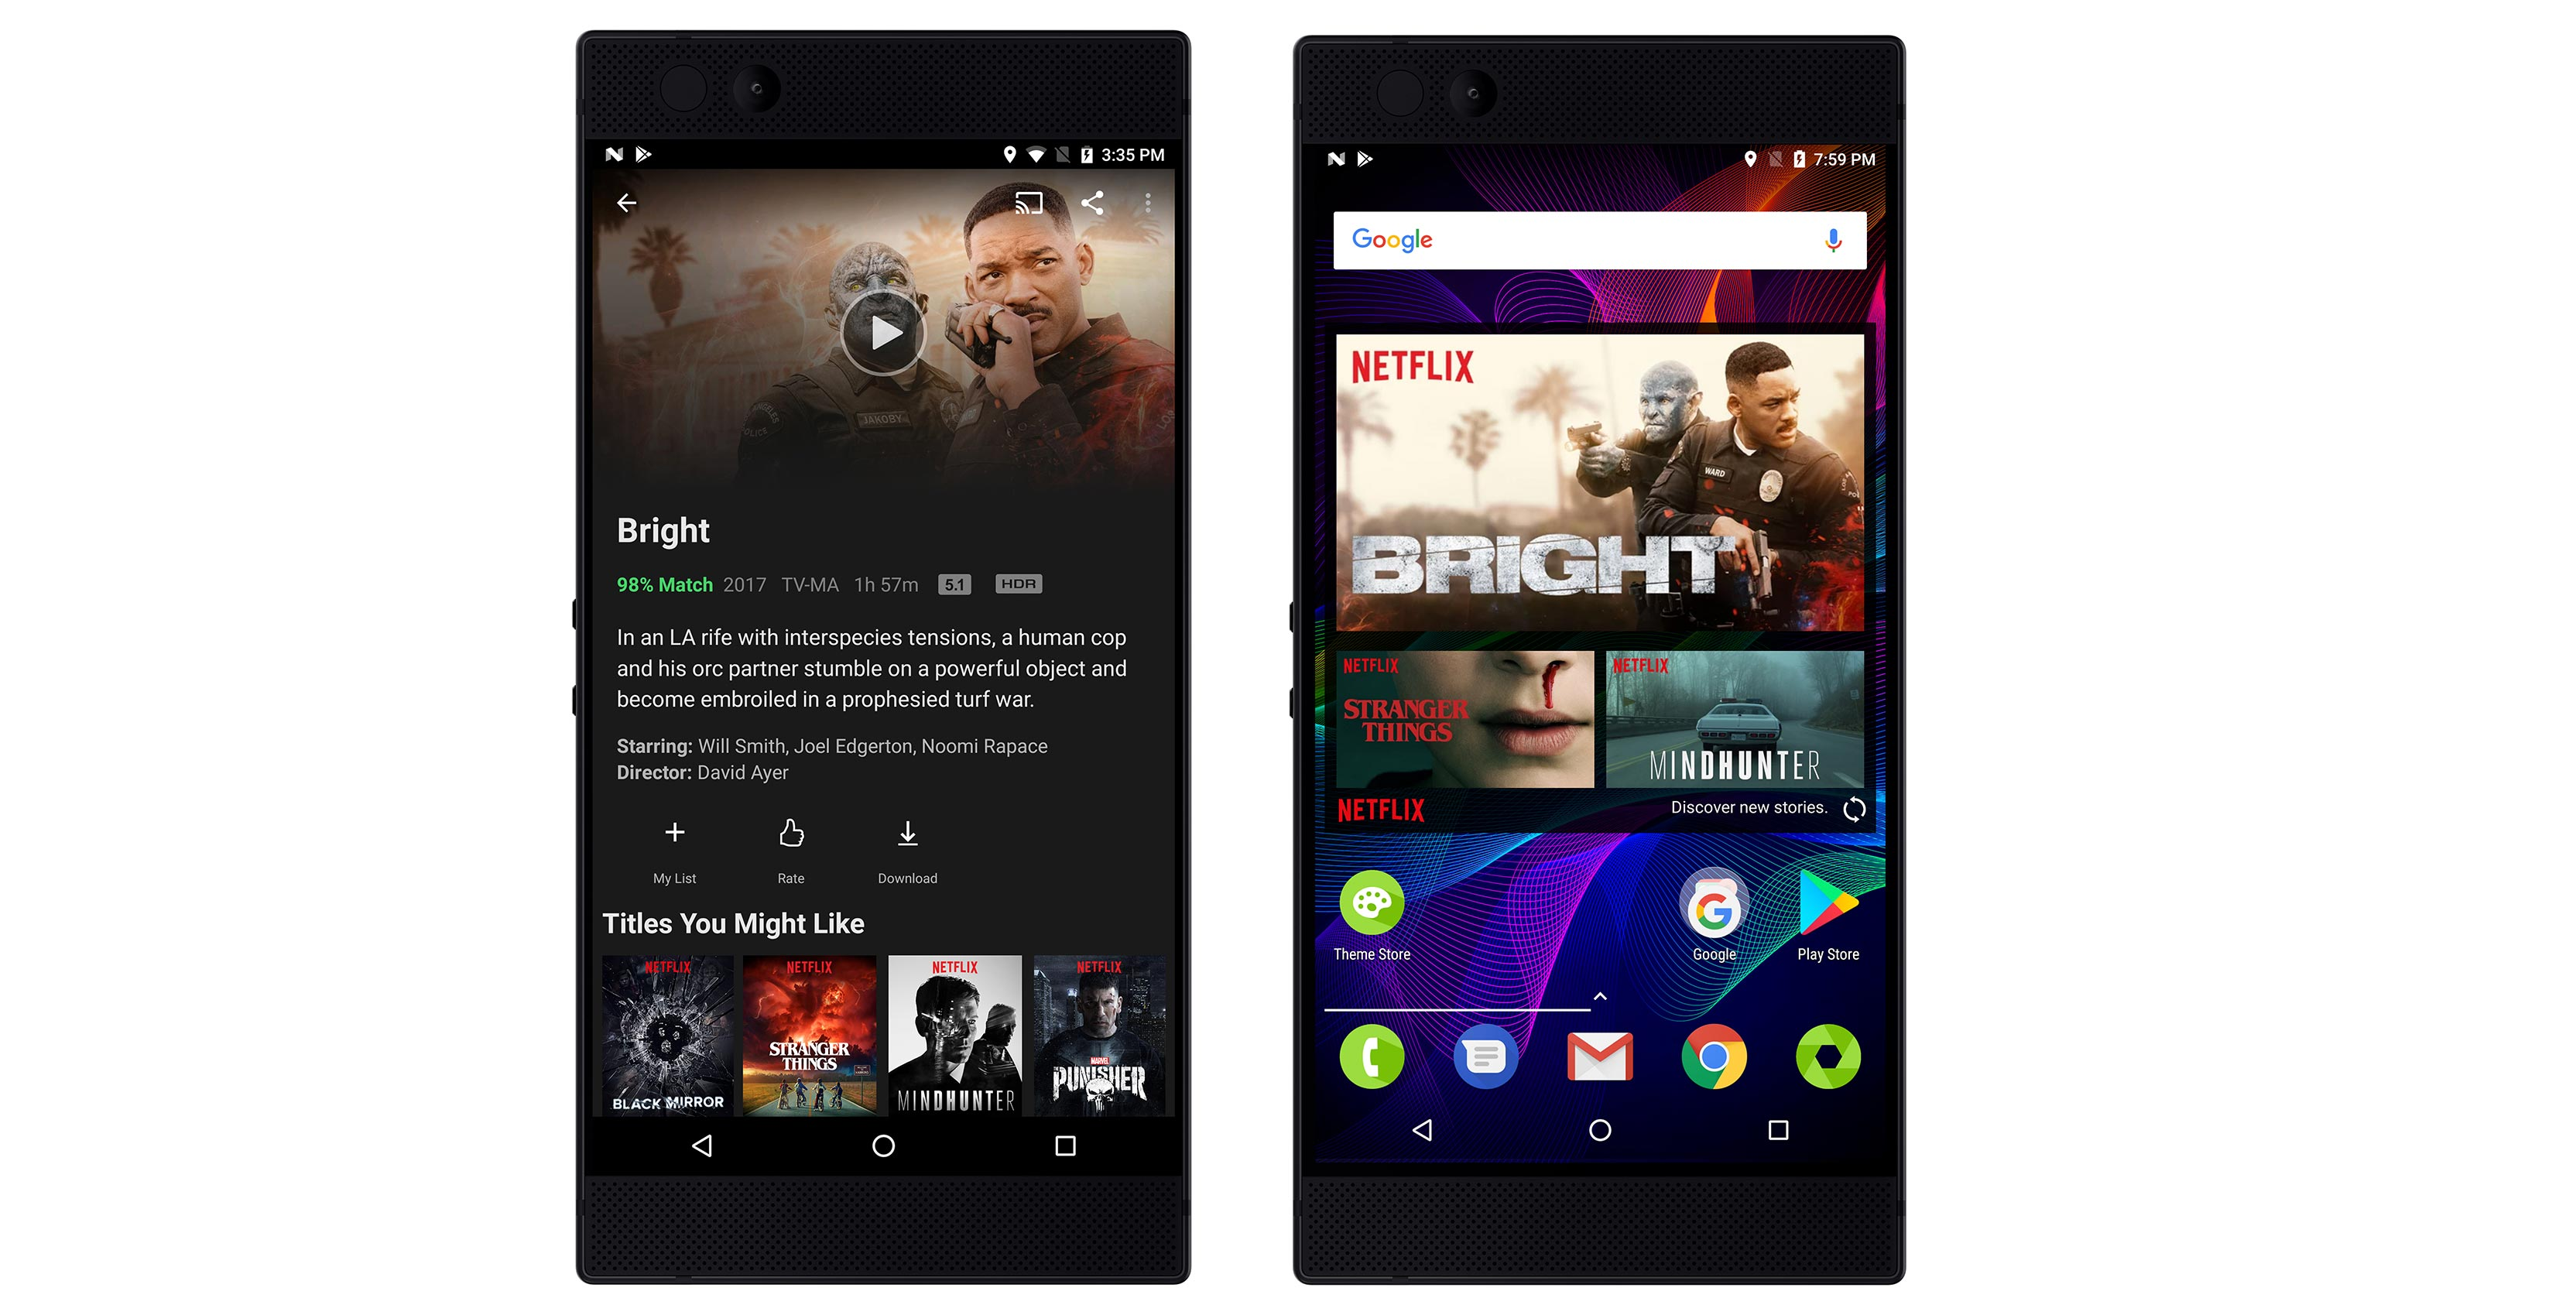 Netflix on Razer Phone